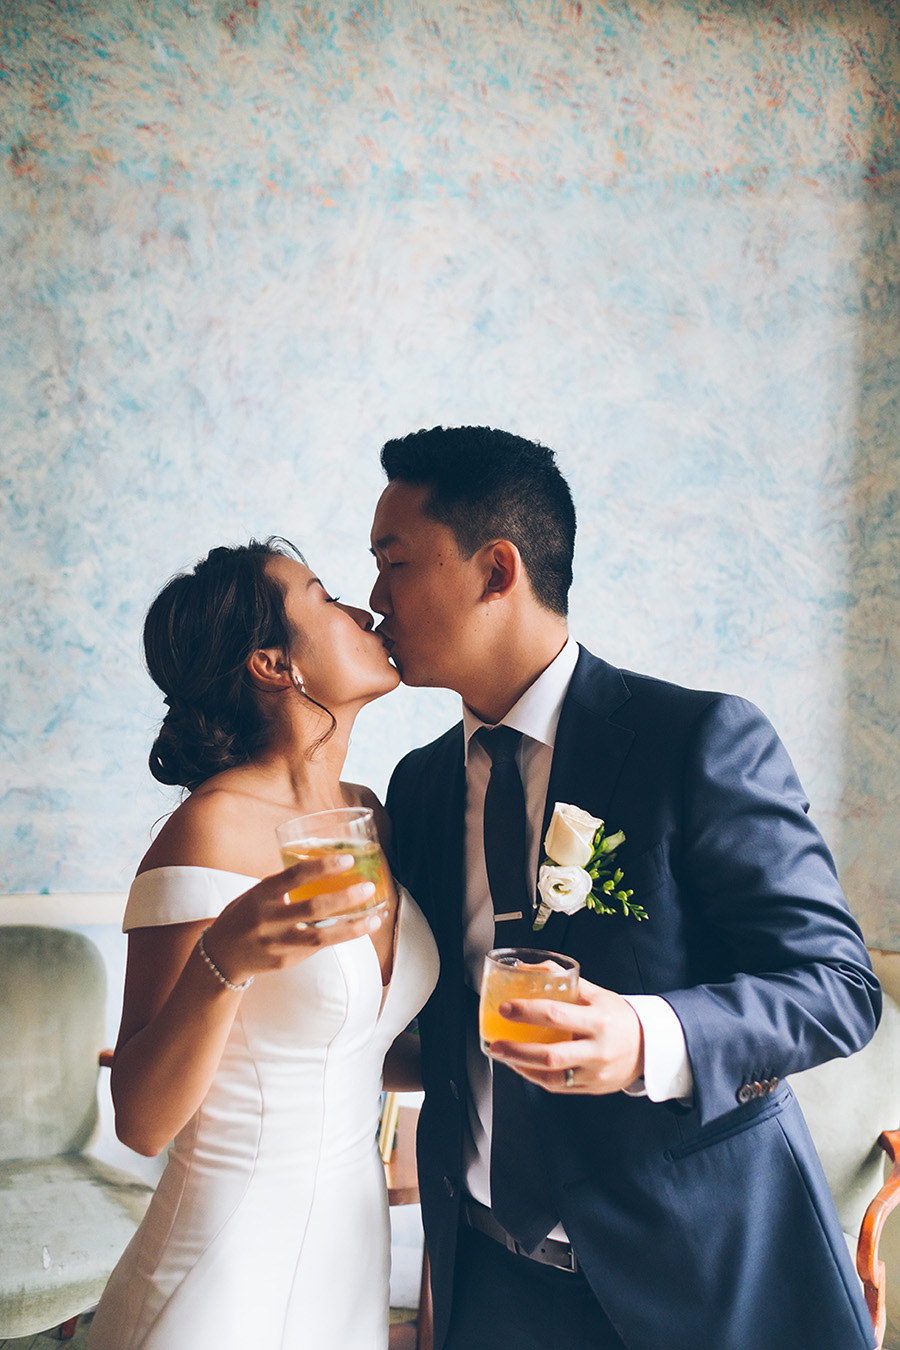 LIN-JOEY-NYC-WEDDING-METROPOLITANBUILDING-CEREMONY-CYNTHIACHUNG-0260.jpg